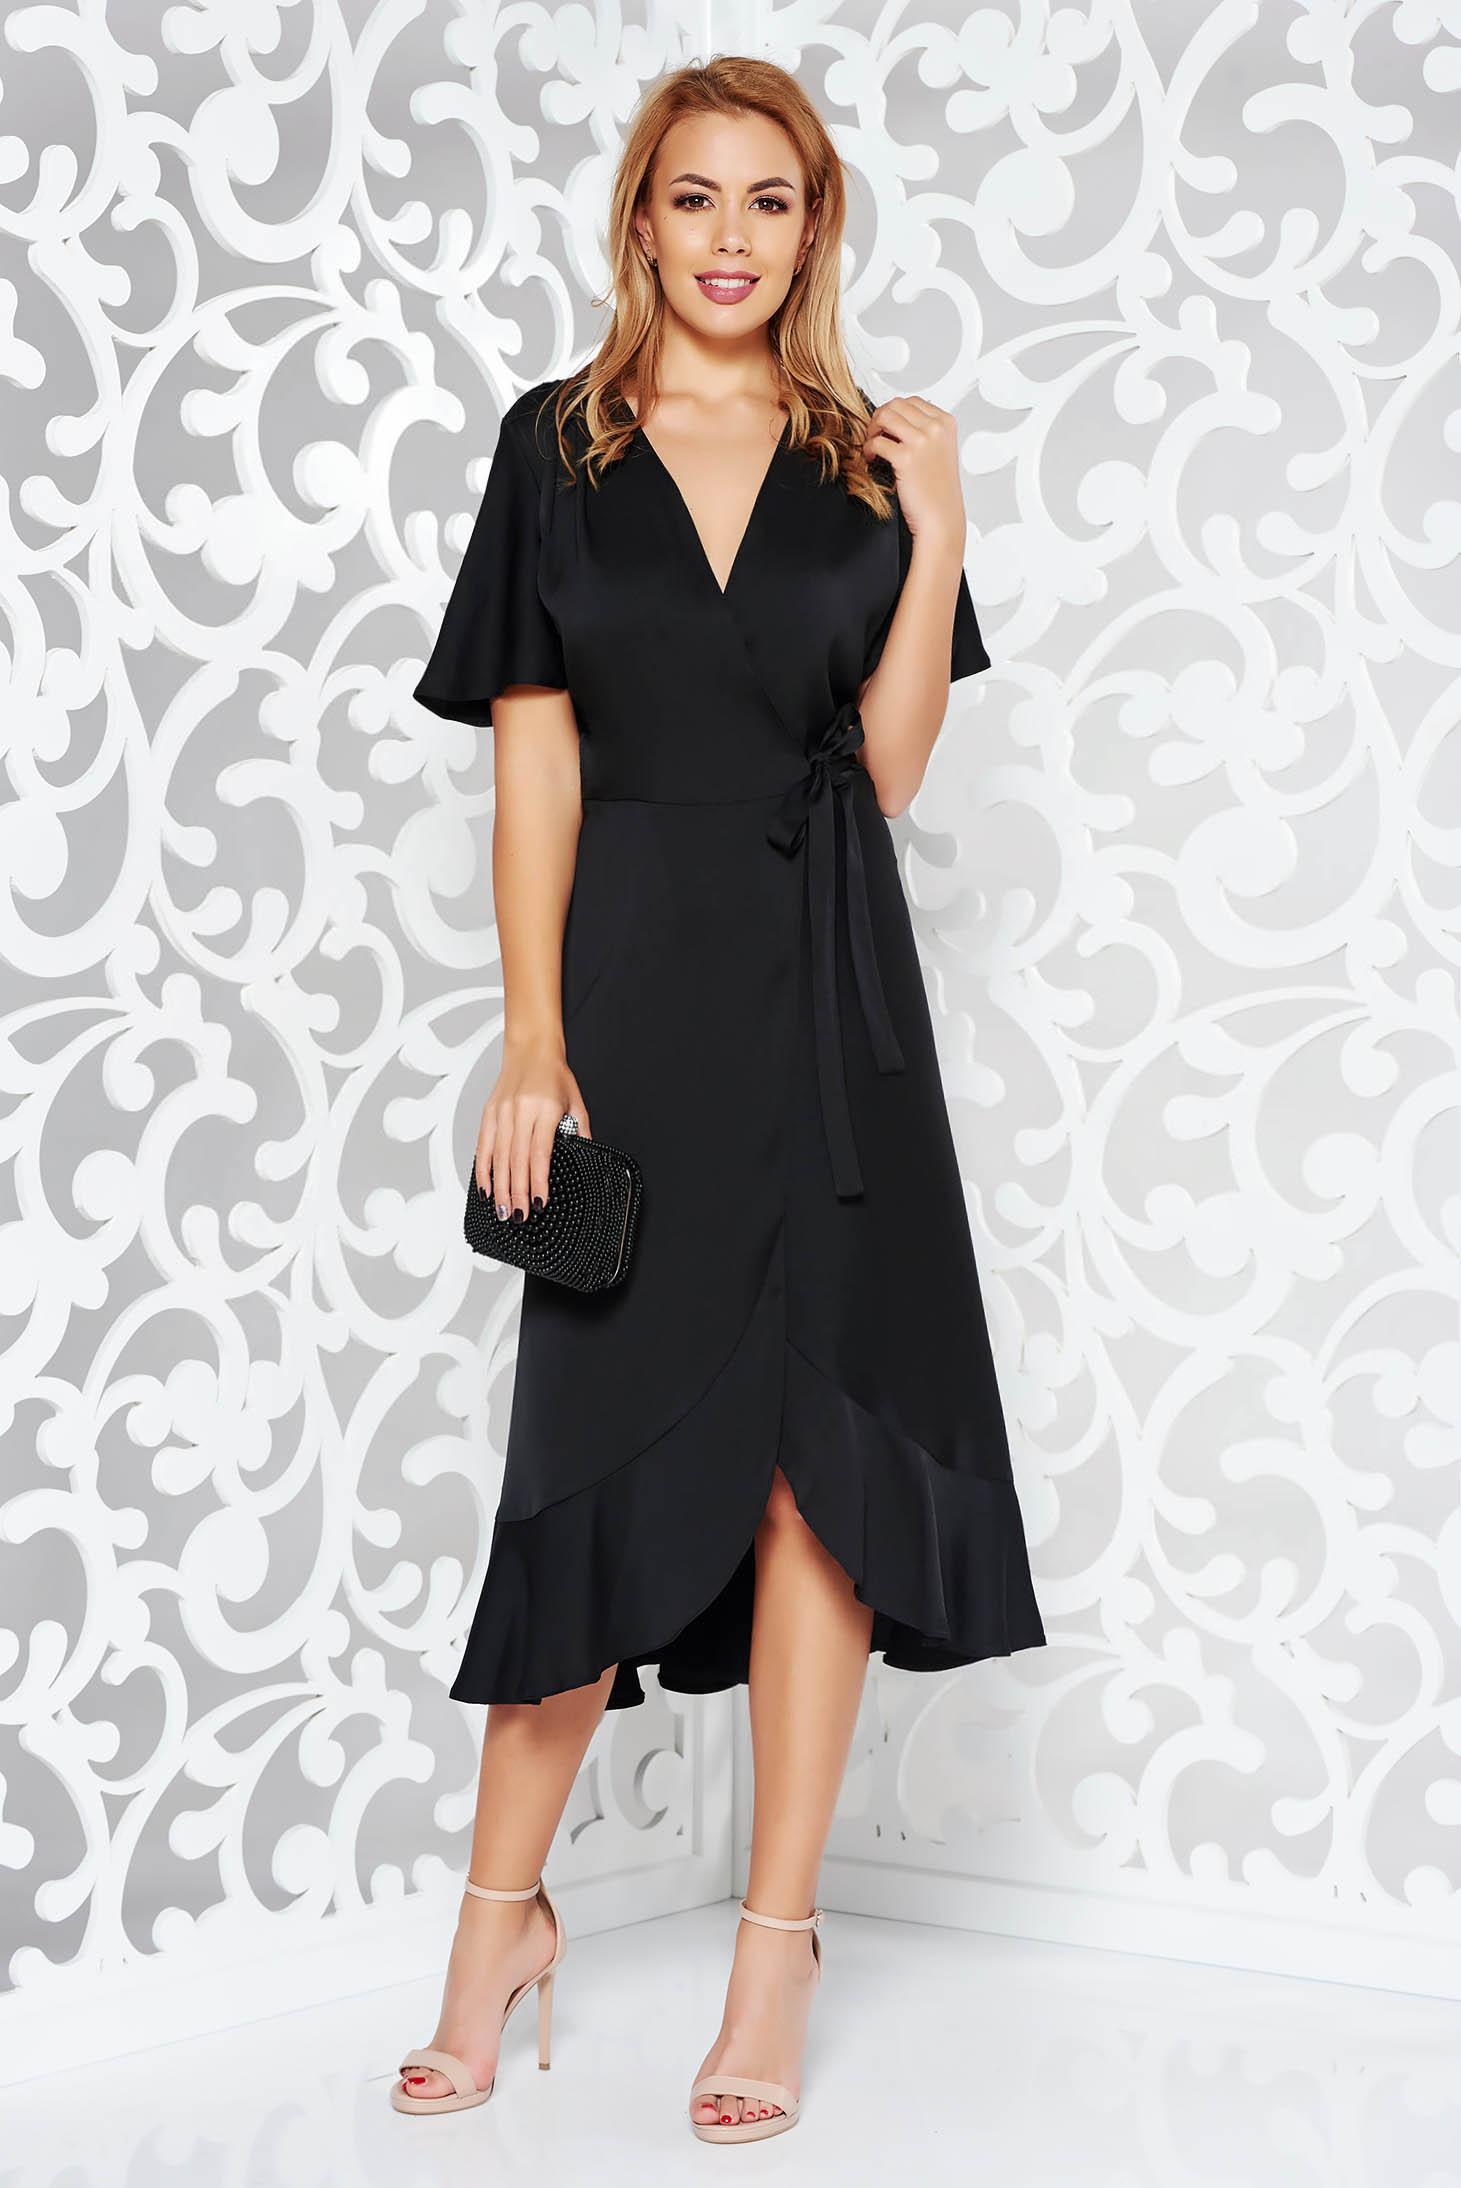 Rochie neagra de ocazie petrecuta din stofa neelastica subtire cu volanase la baza rochiei